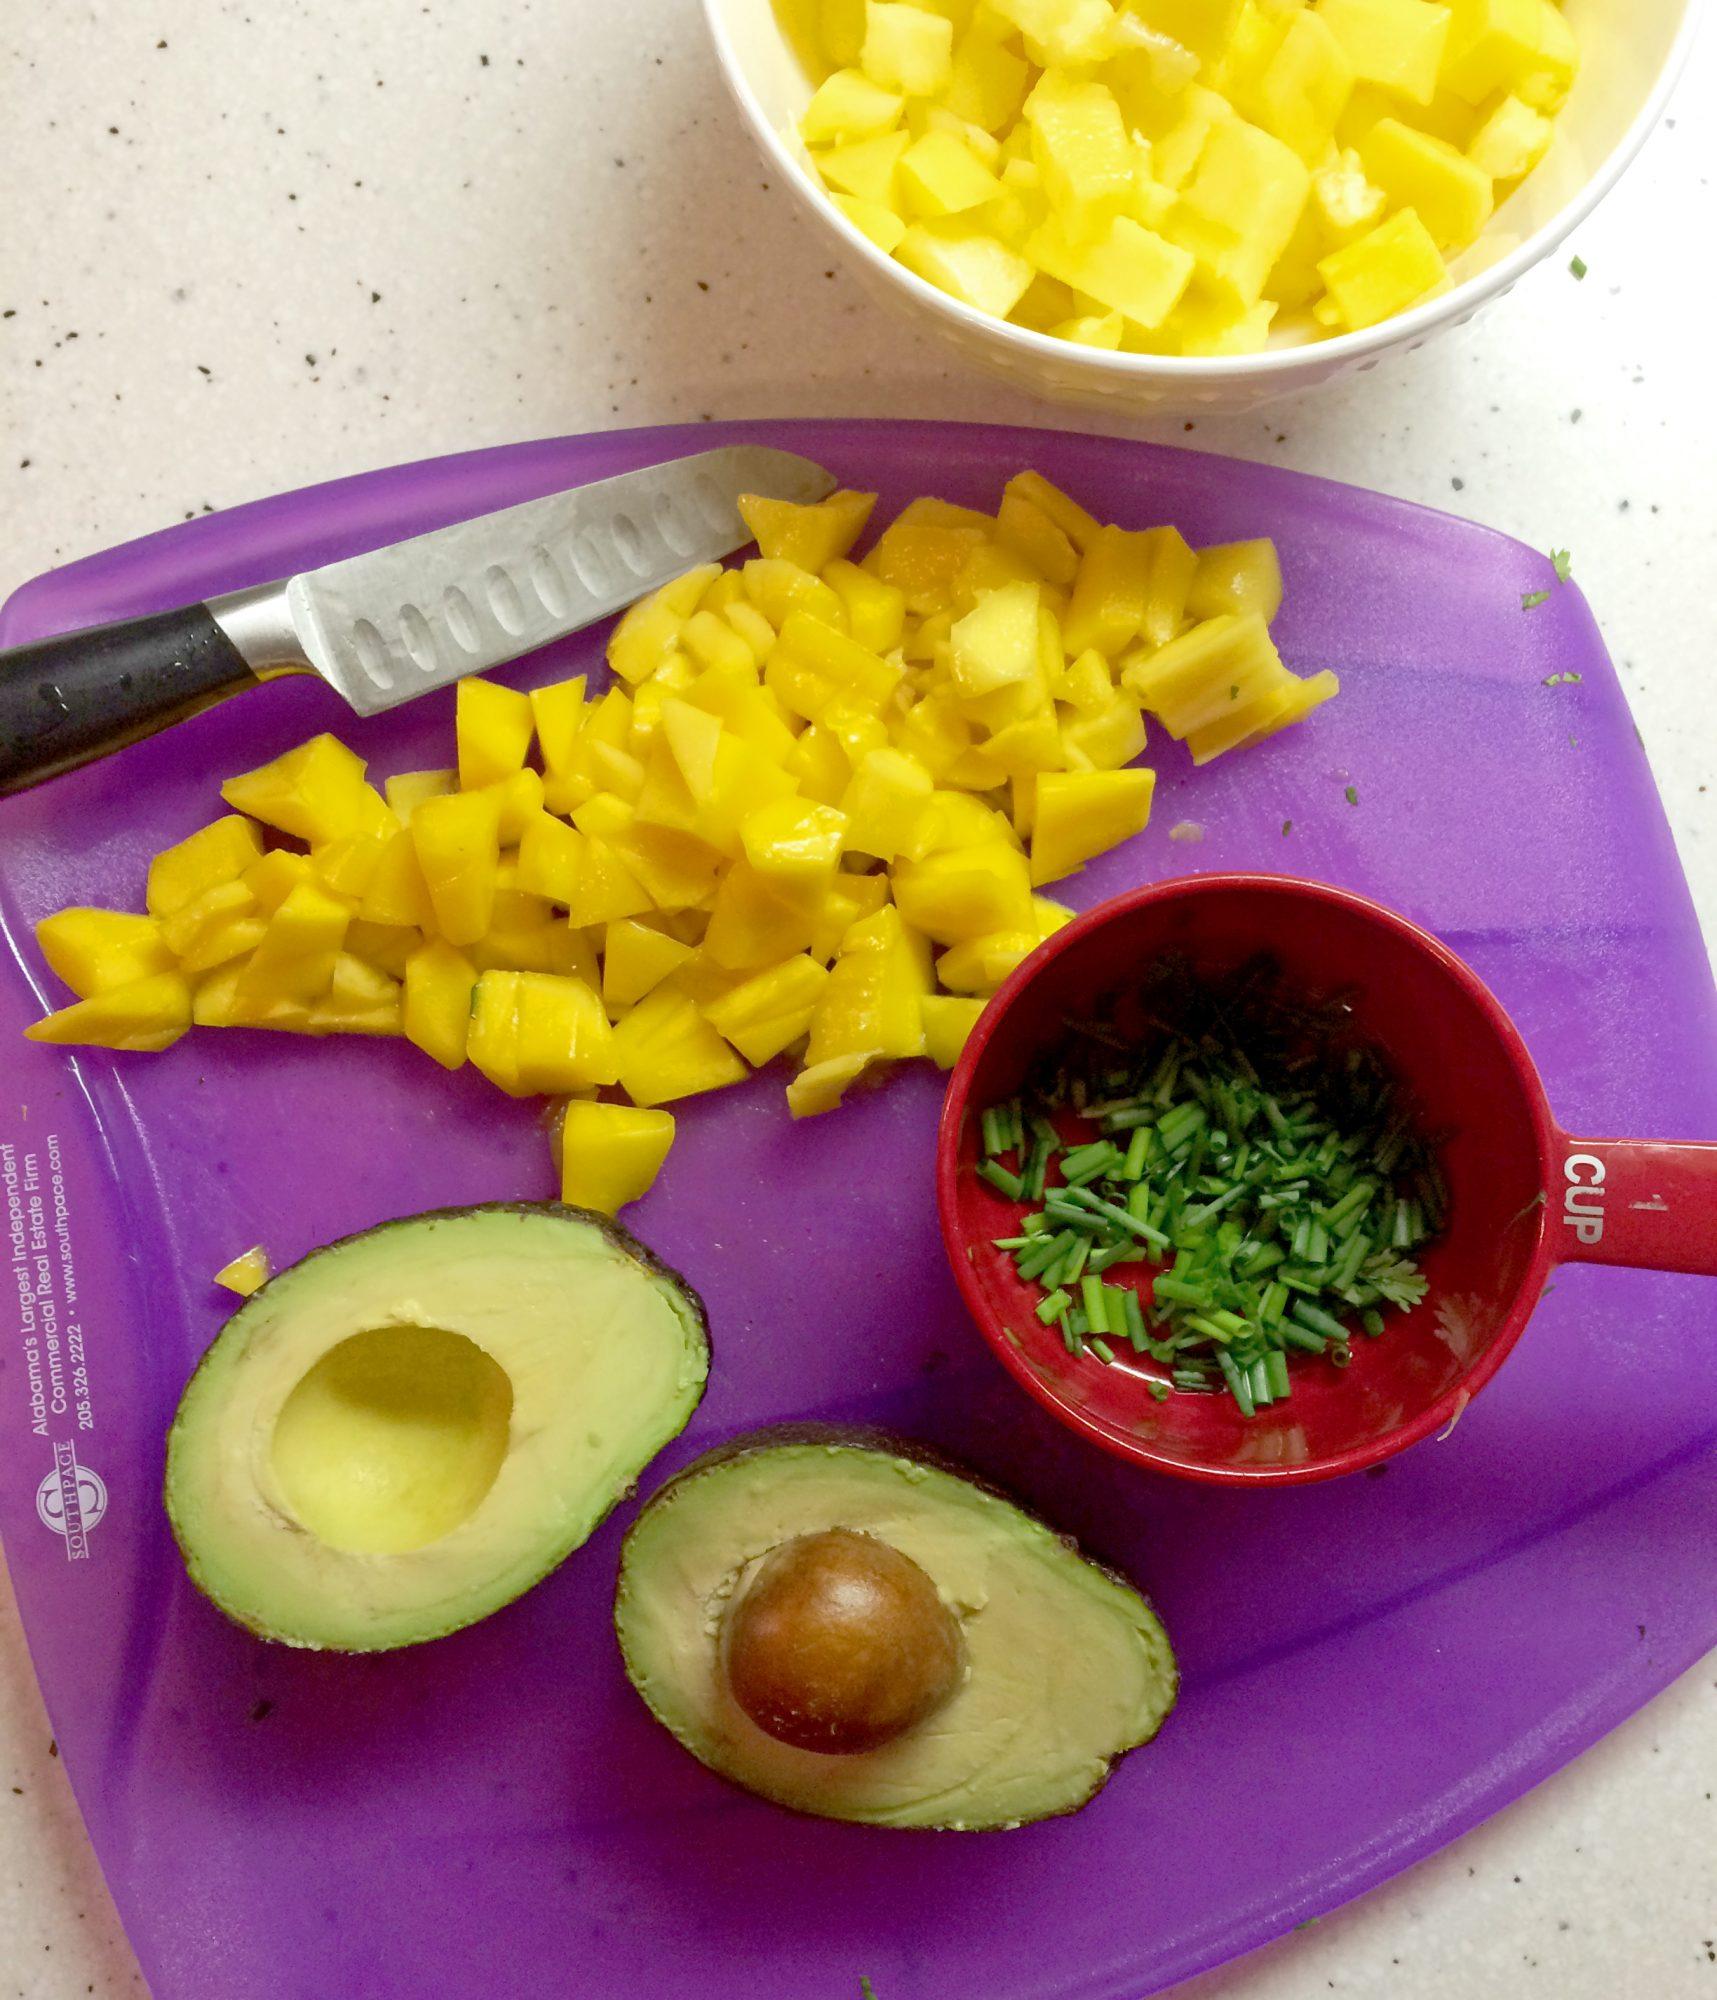 chopped-fruit-herbs.jpg